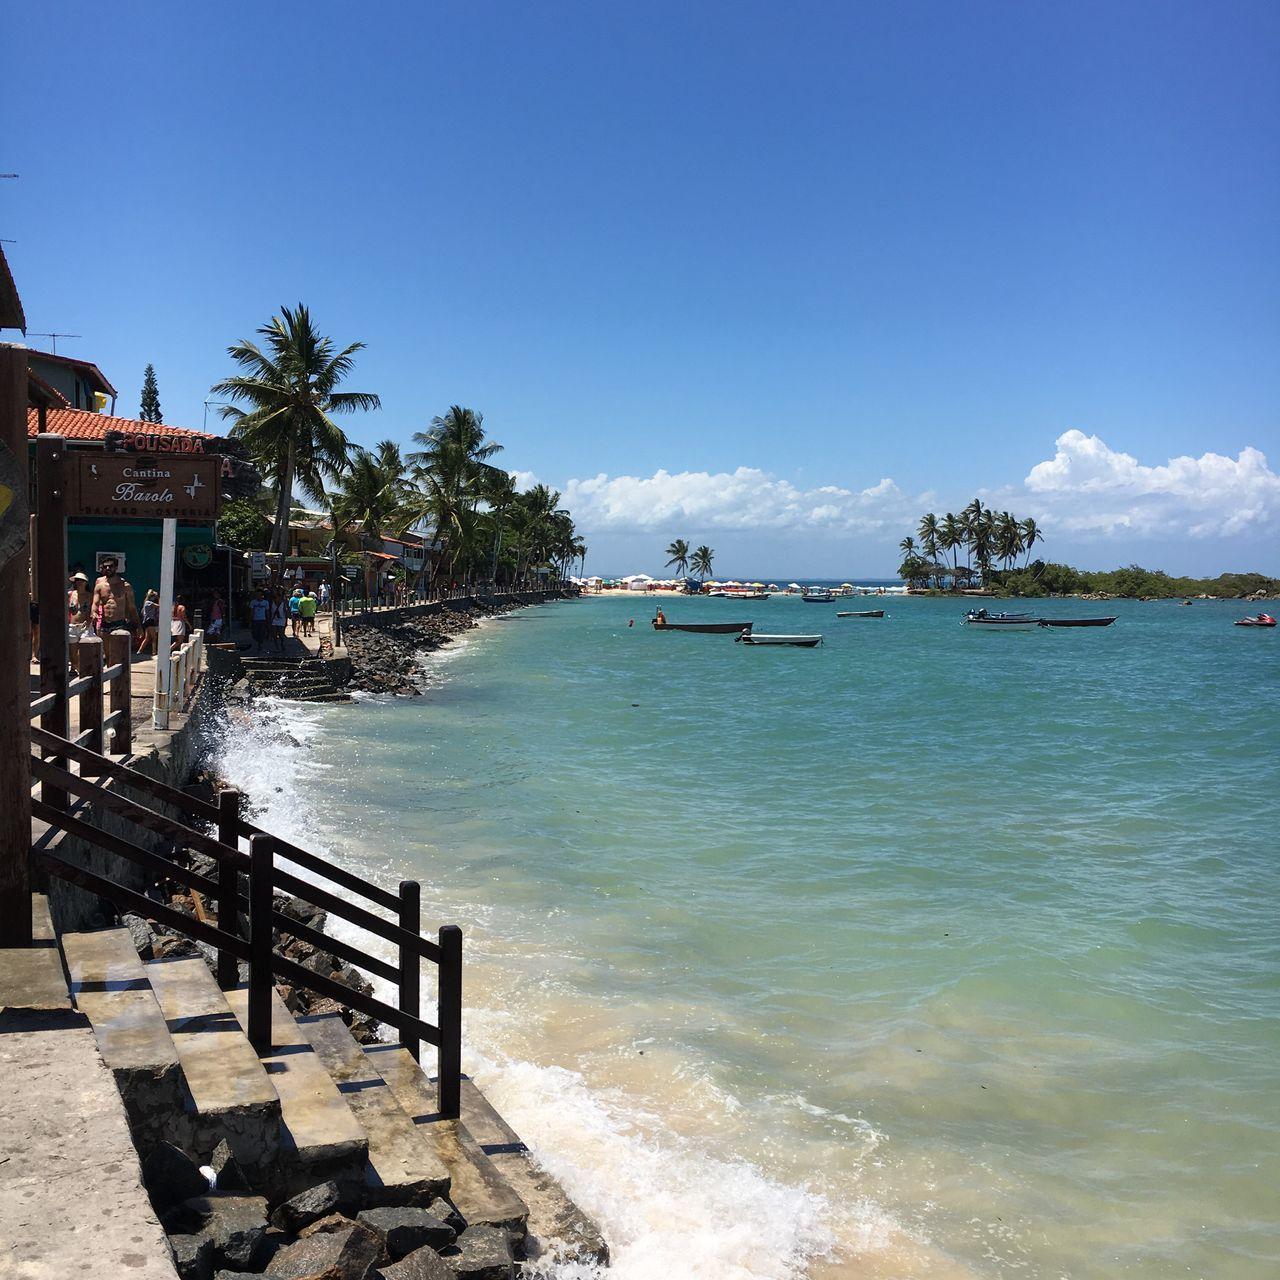 Beachphotography Brazil Beach Bahia